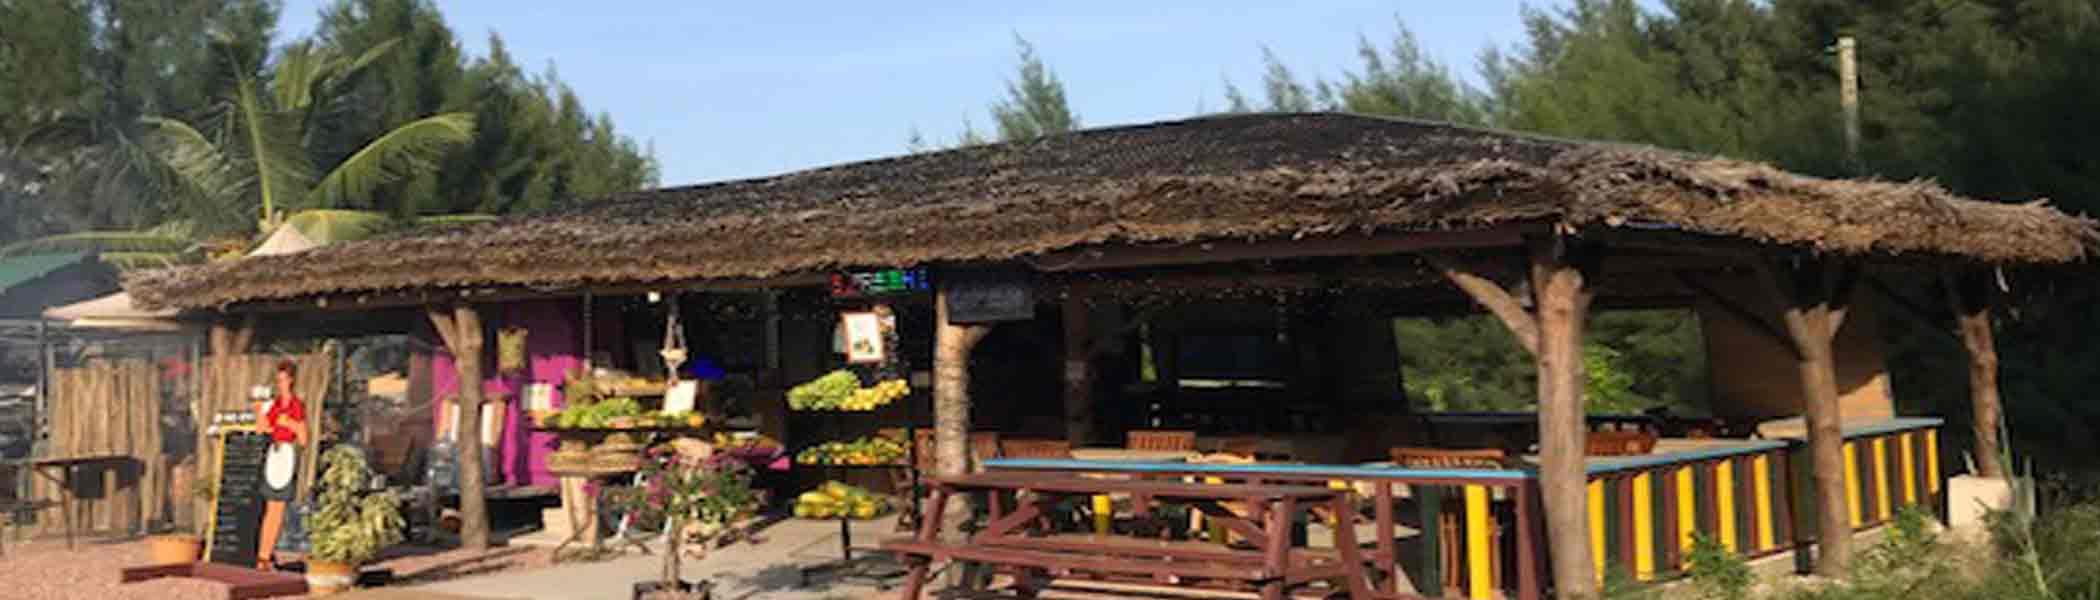 cool-licks, Bars and restaurants in Seychelles Islands